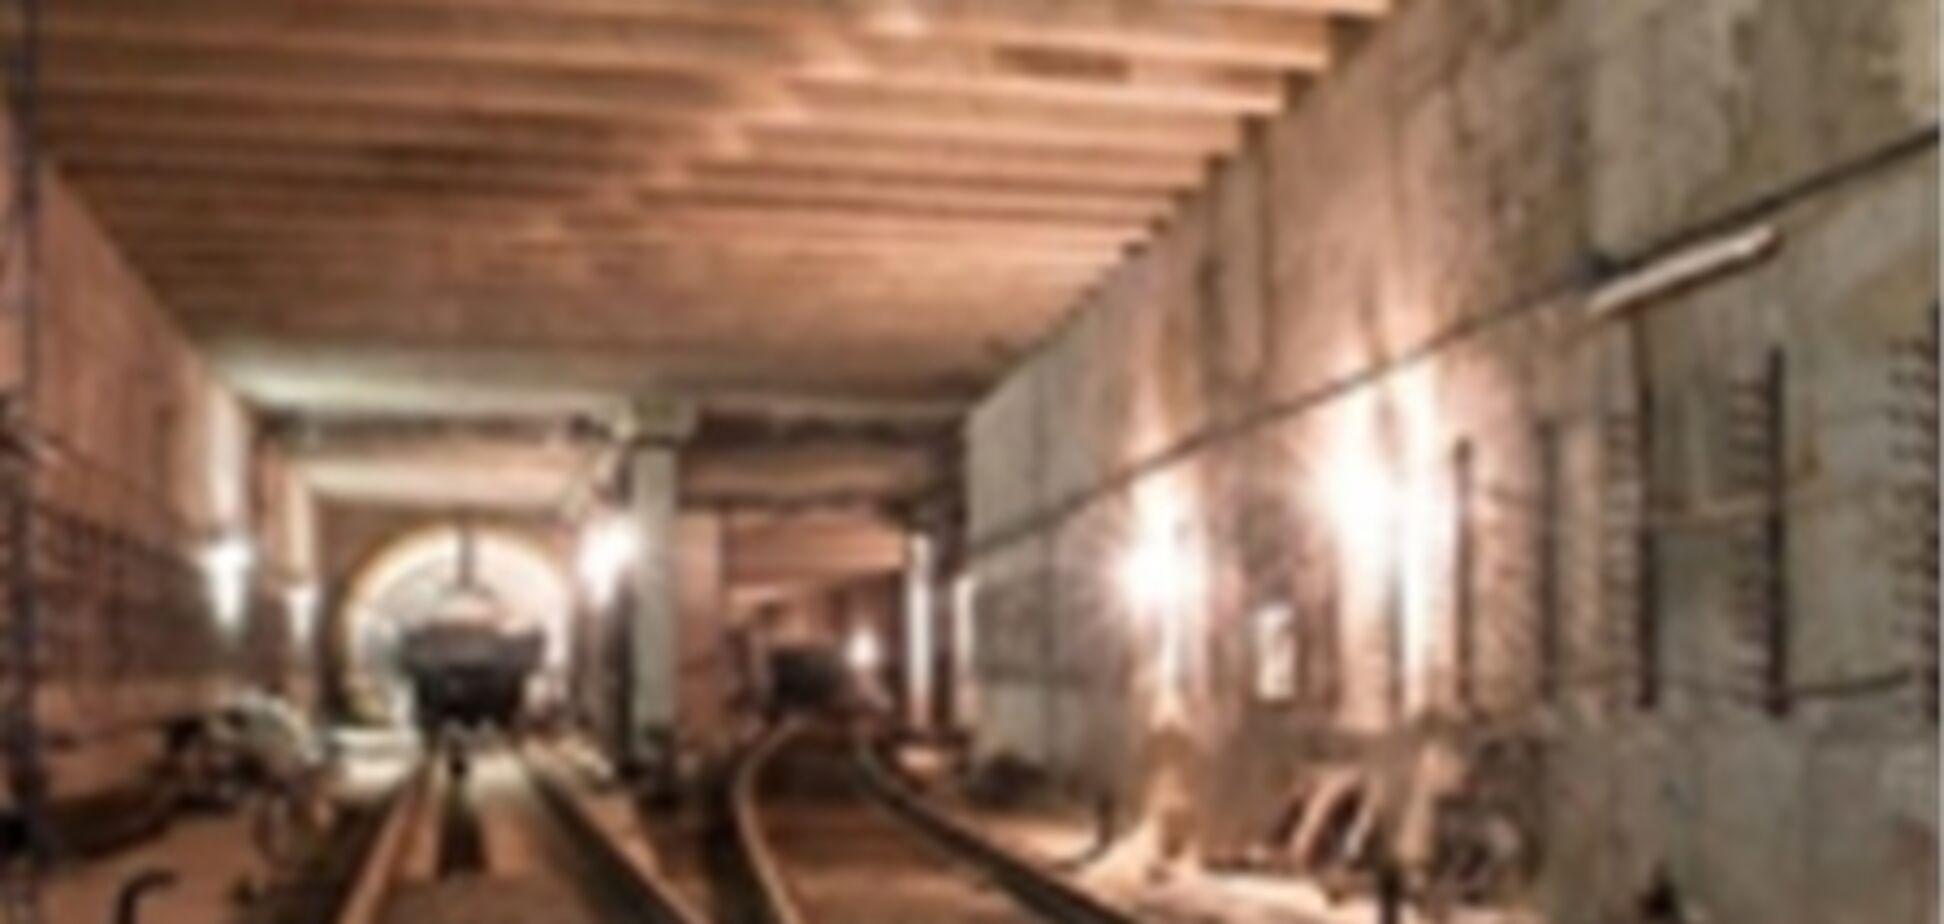 Станцию метро 'Теремки' обещают достроить вовремя